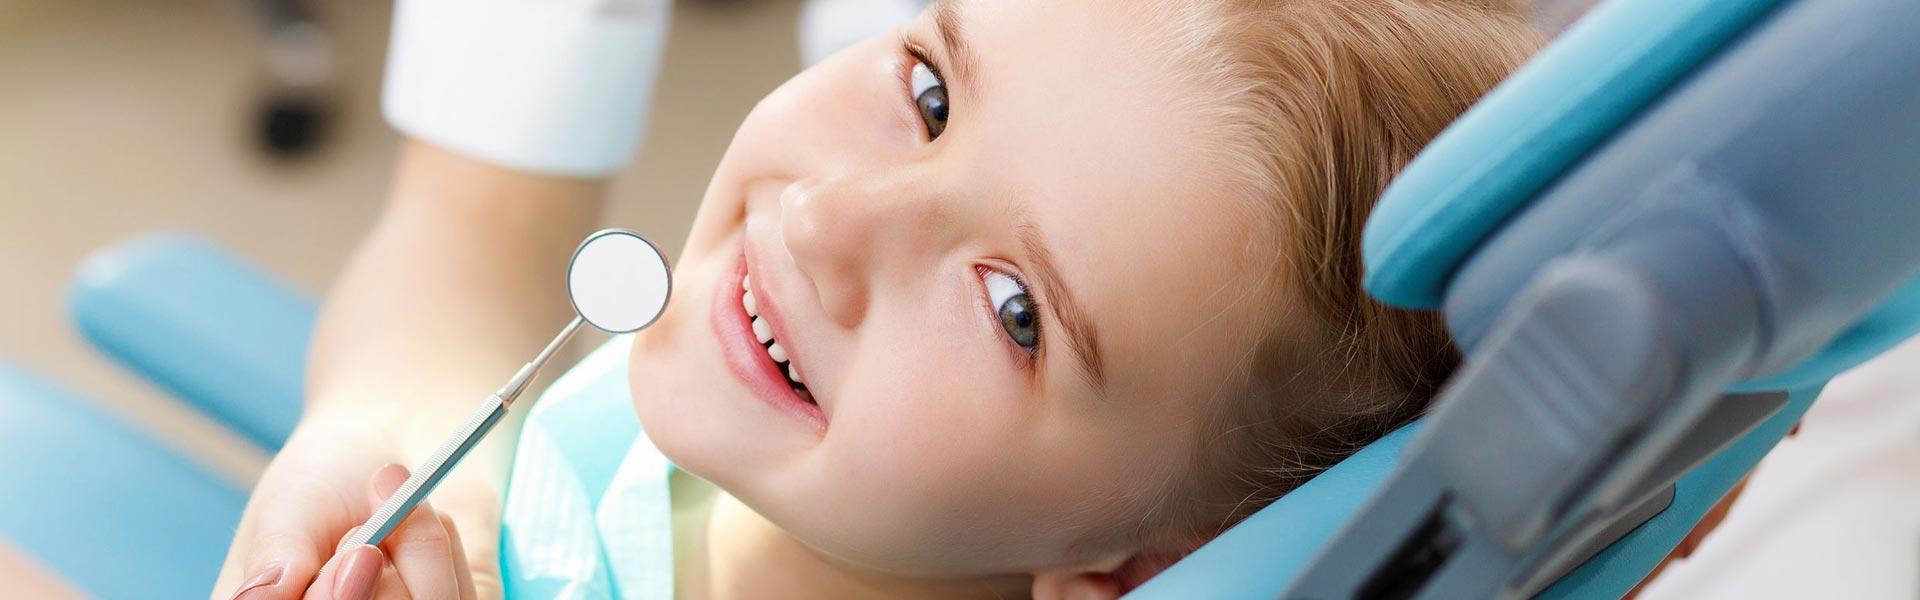 Studio-dentistico-Dental-Piu-02